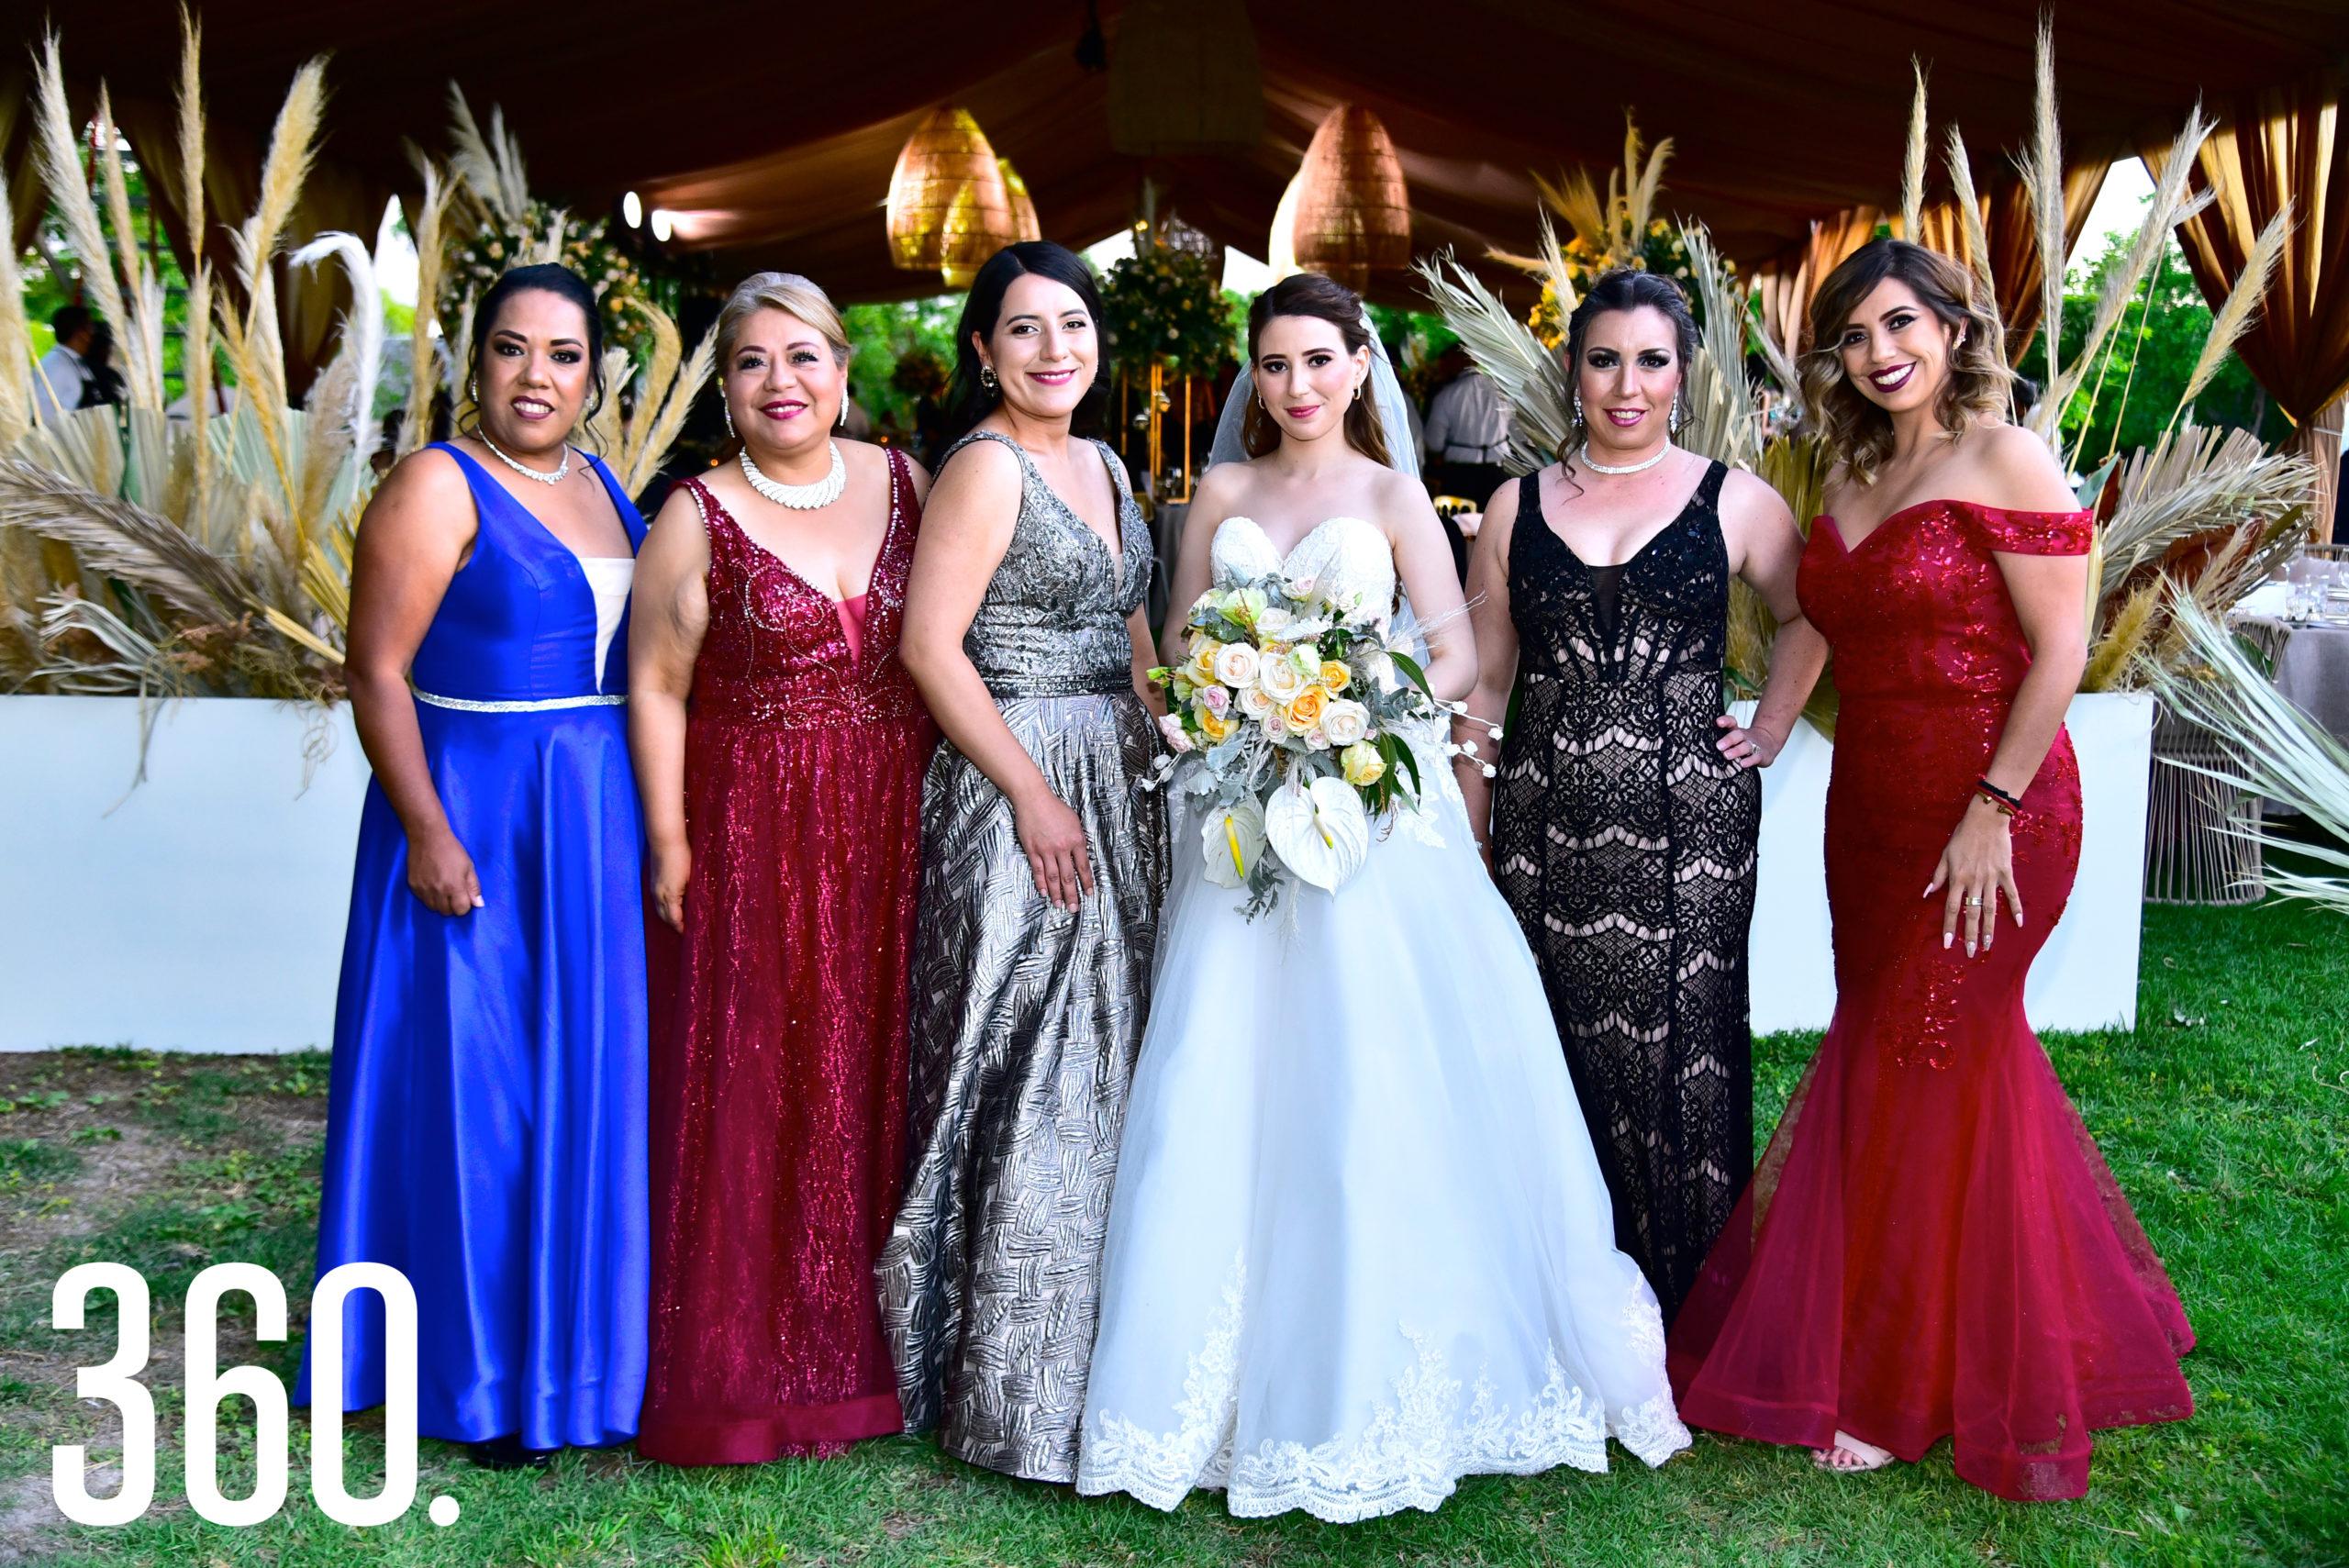 Karina Cerda, Lupita Gallegos, Daniely Ayala, Marycarmen Rodríguez, Elsa Gómez y Gloria Zúñiga.